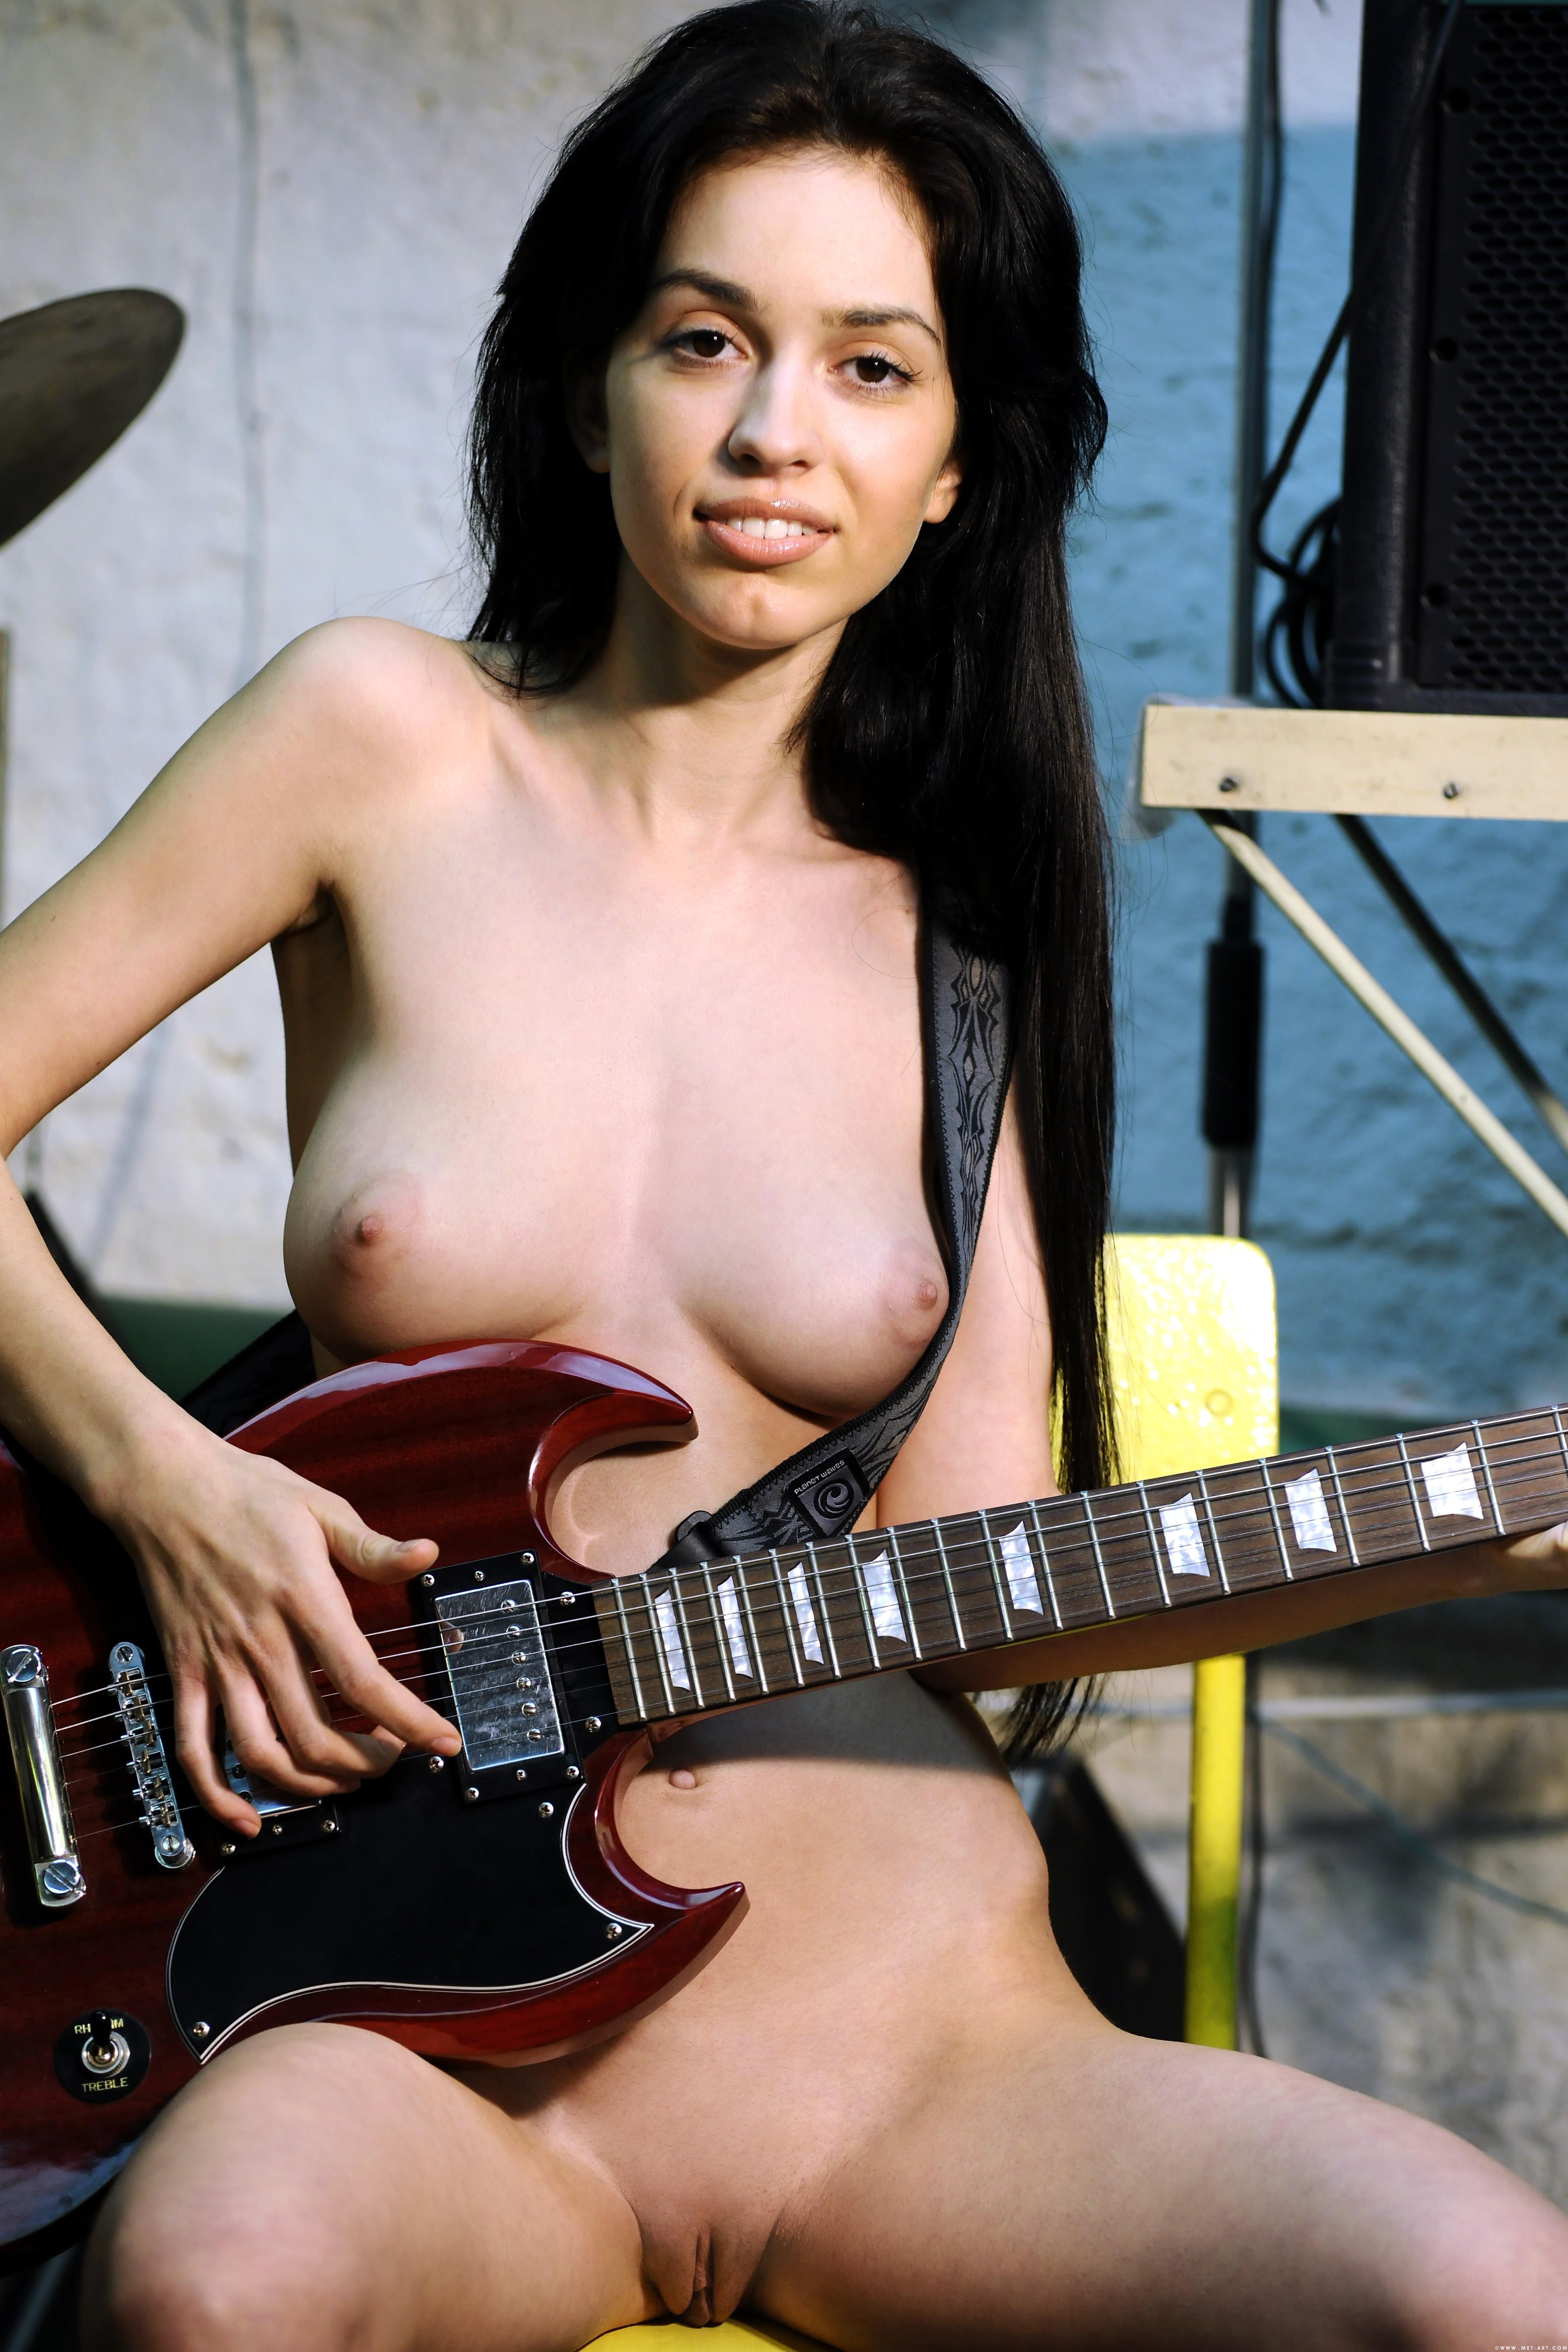 Секс рок фото 14 фотография